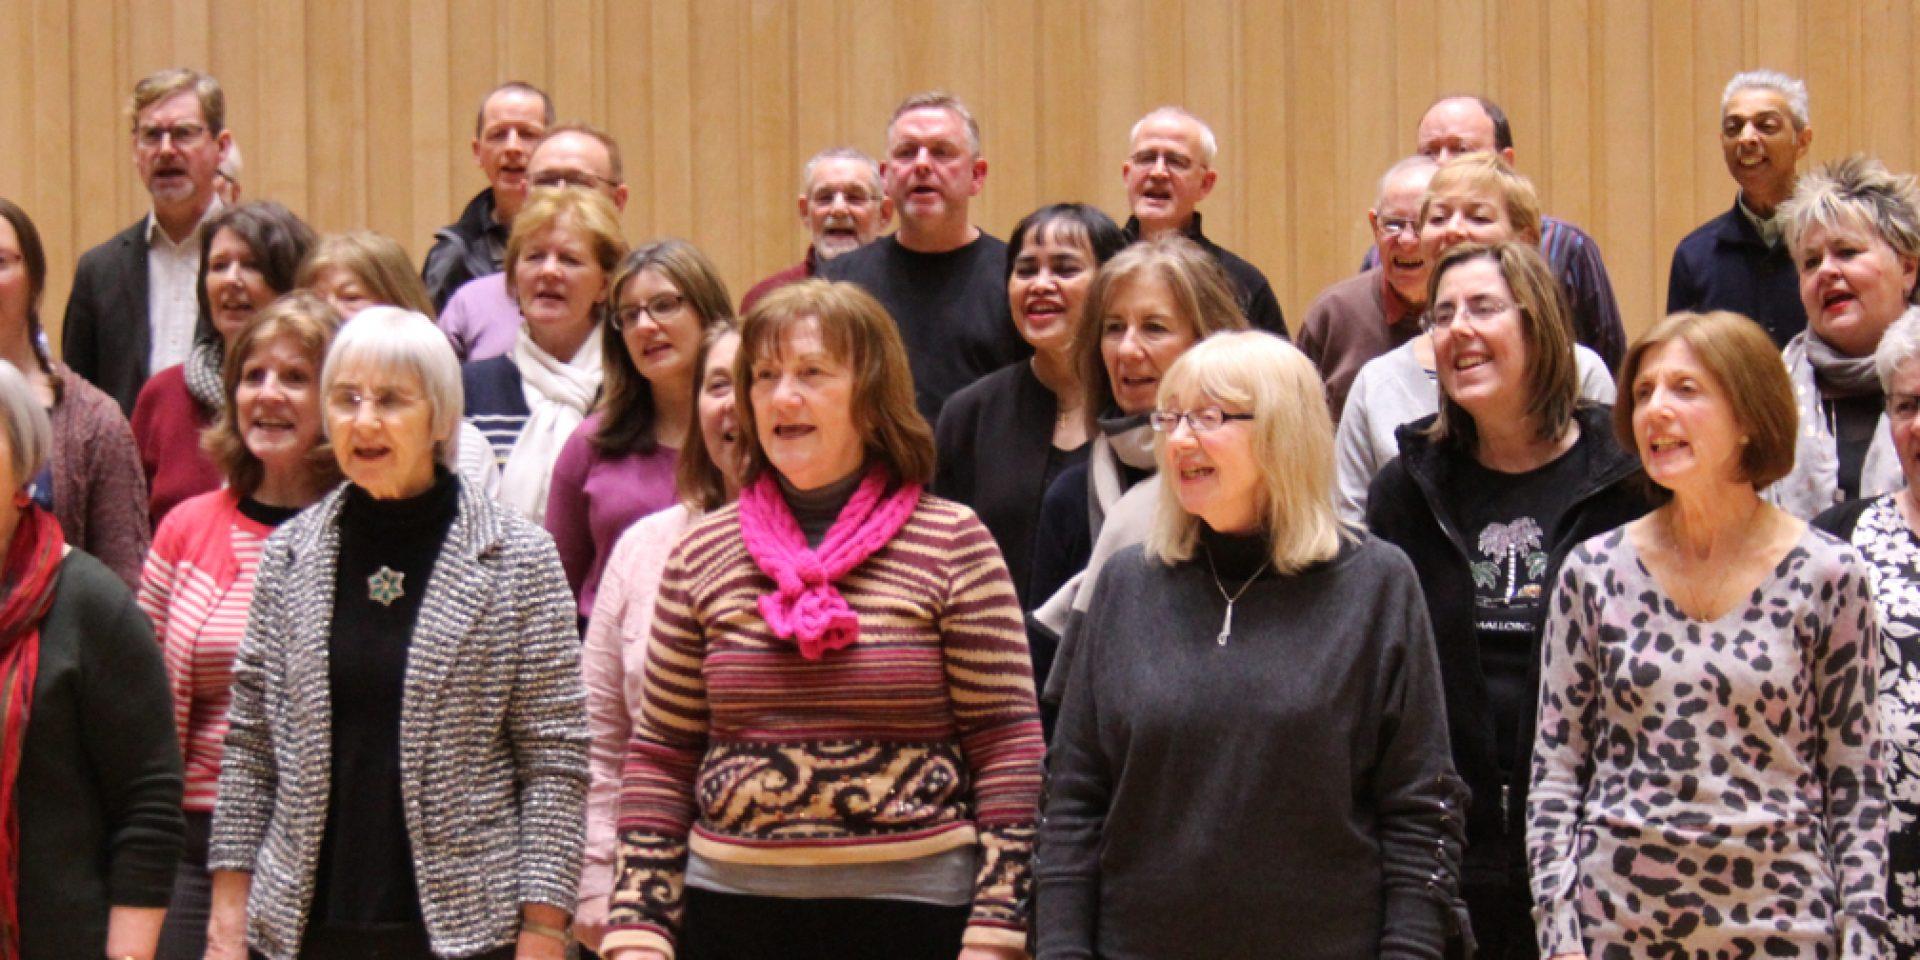 Dundee Workplace Choir